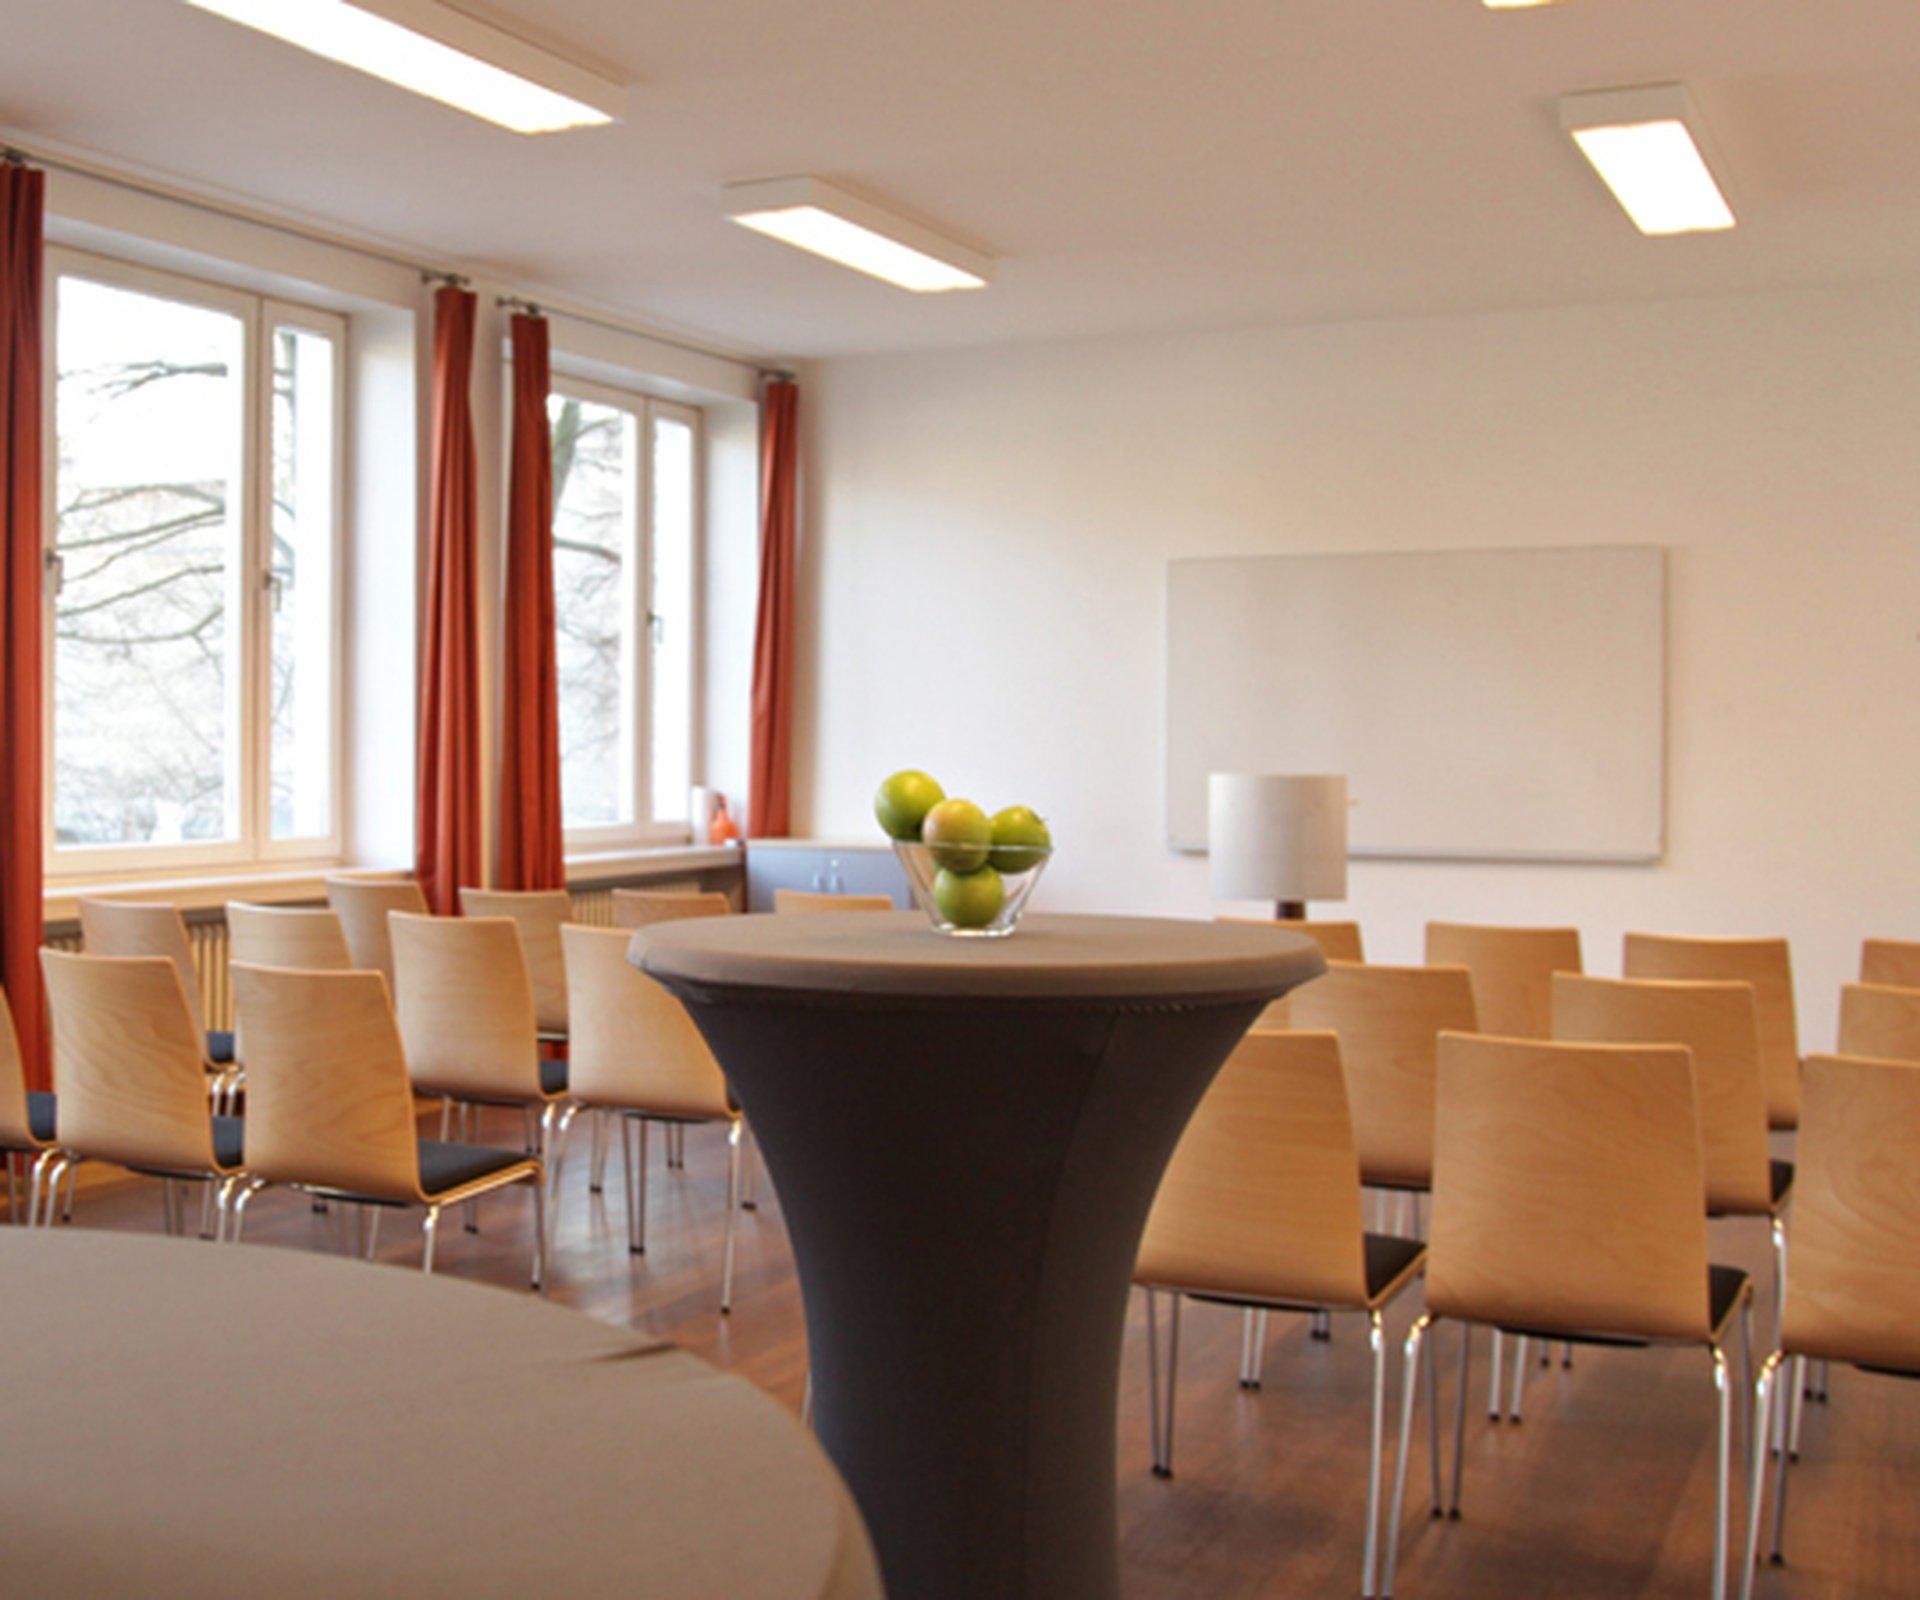 Berlin training rooms Meetingraum GLS Campus - Seminar Room 1 image 0